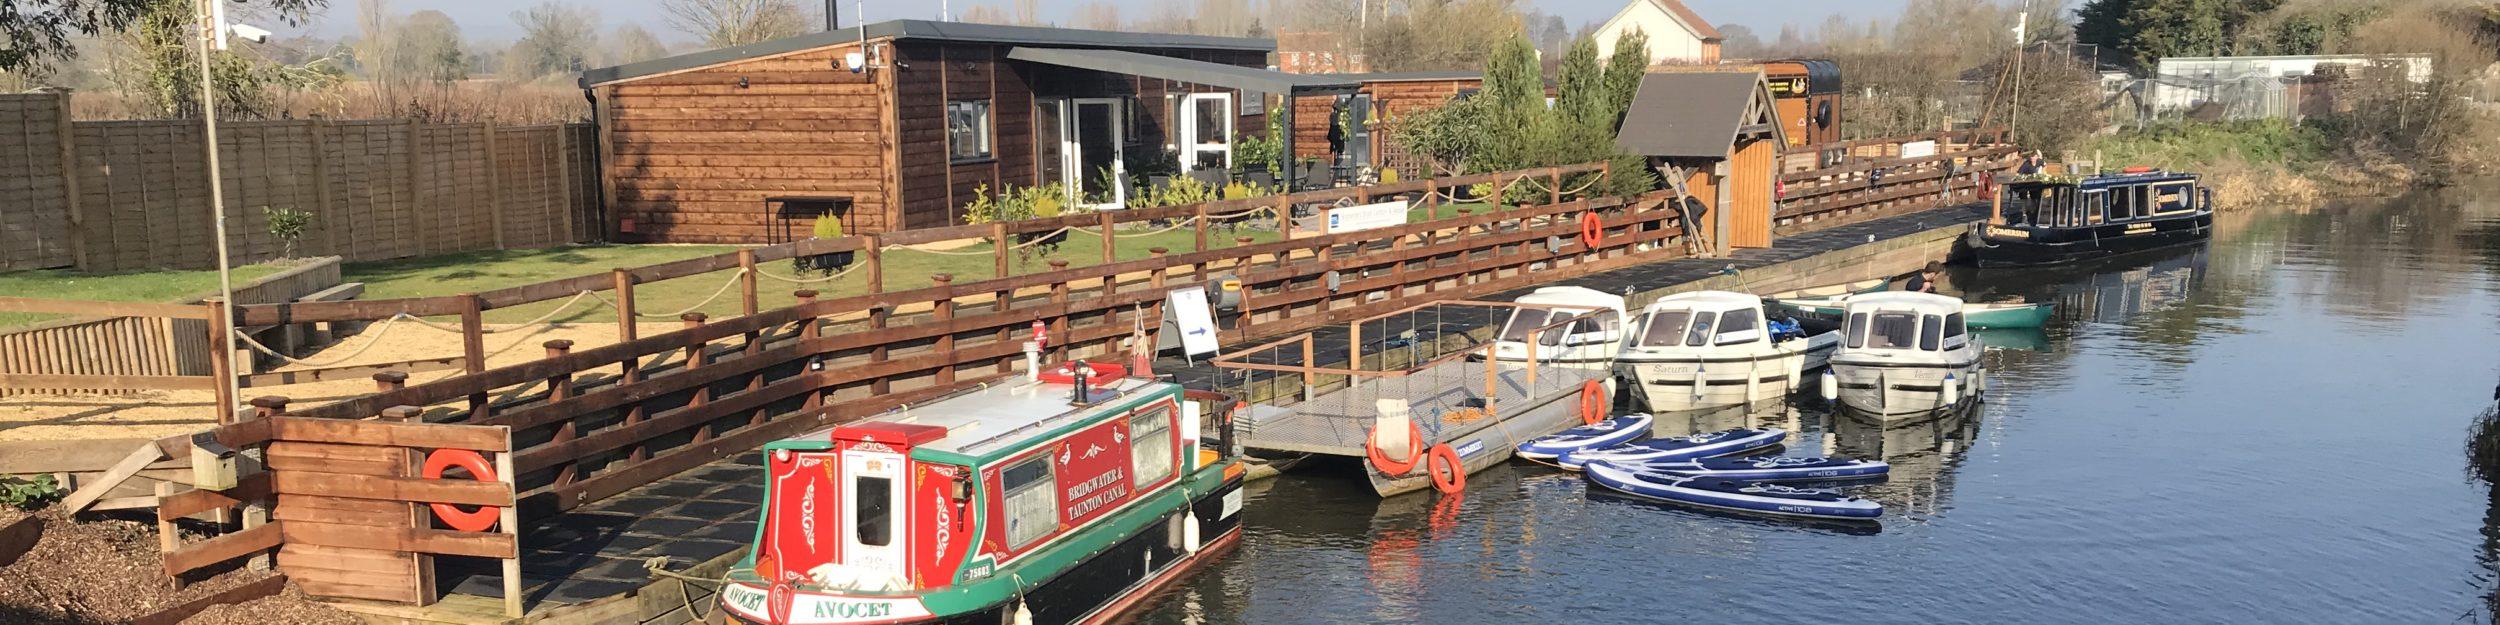 Somerset Boat Centre